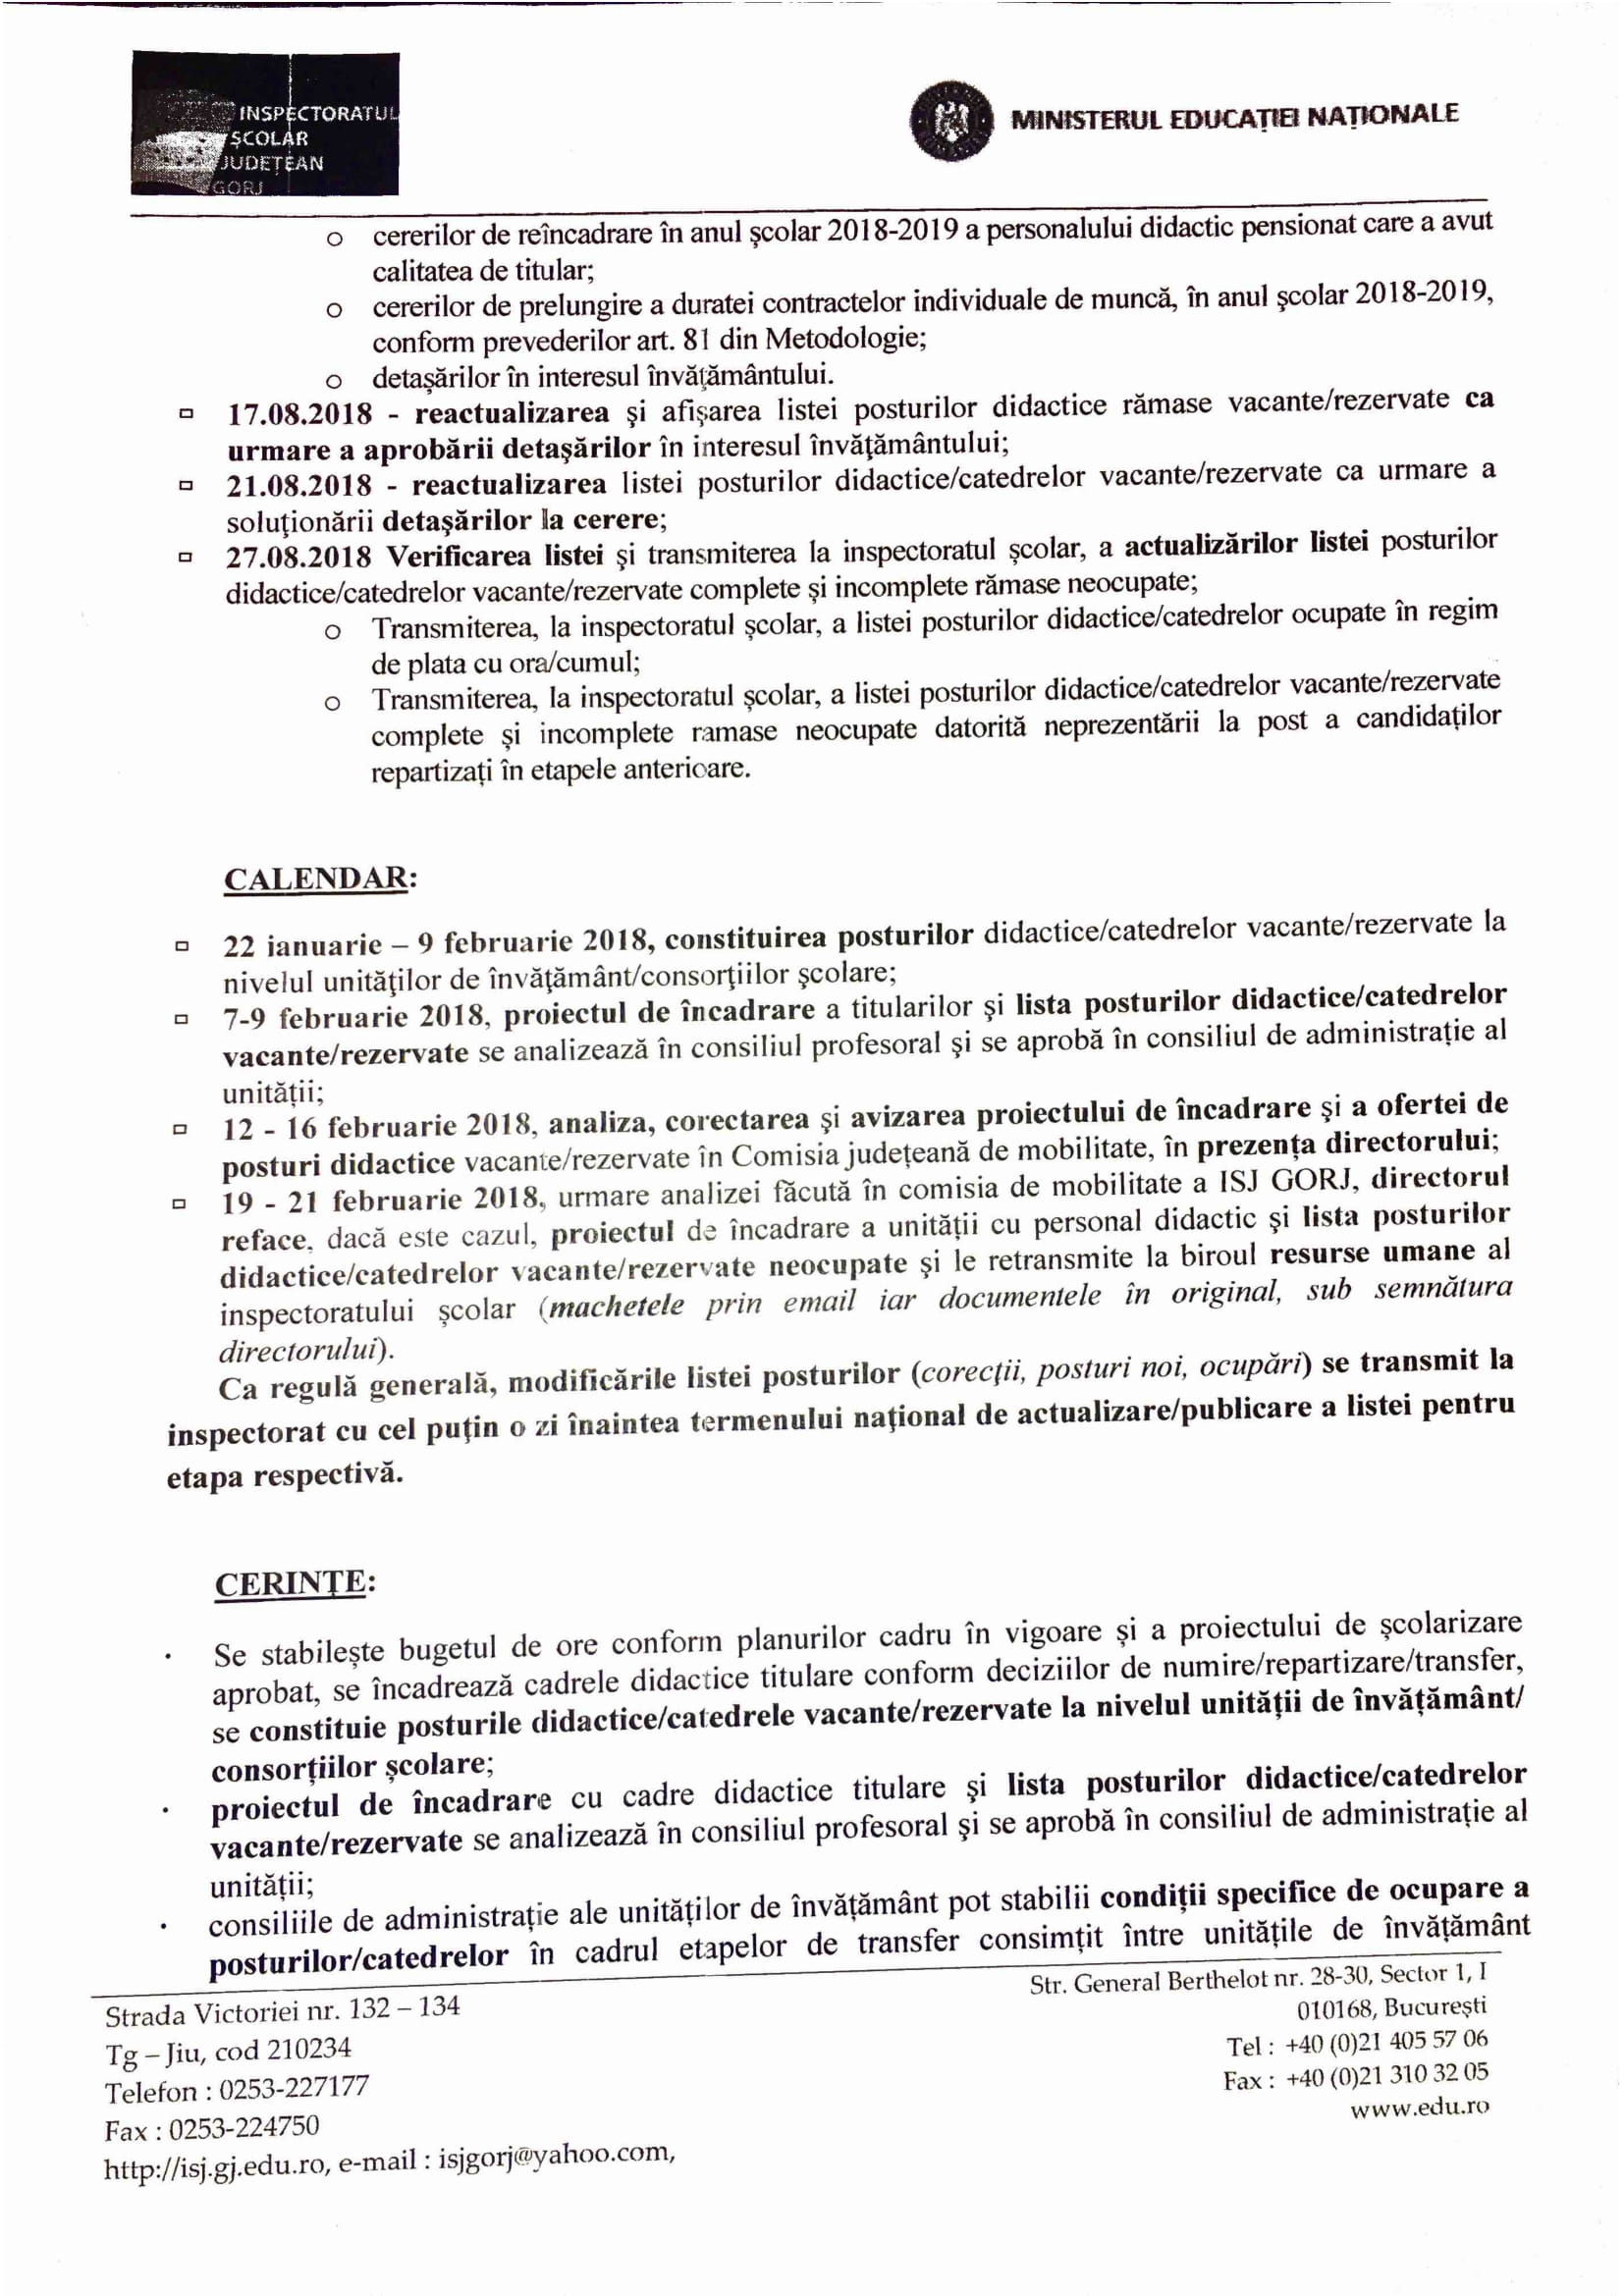 Adresa constituire_încadrare_vacantare-6